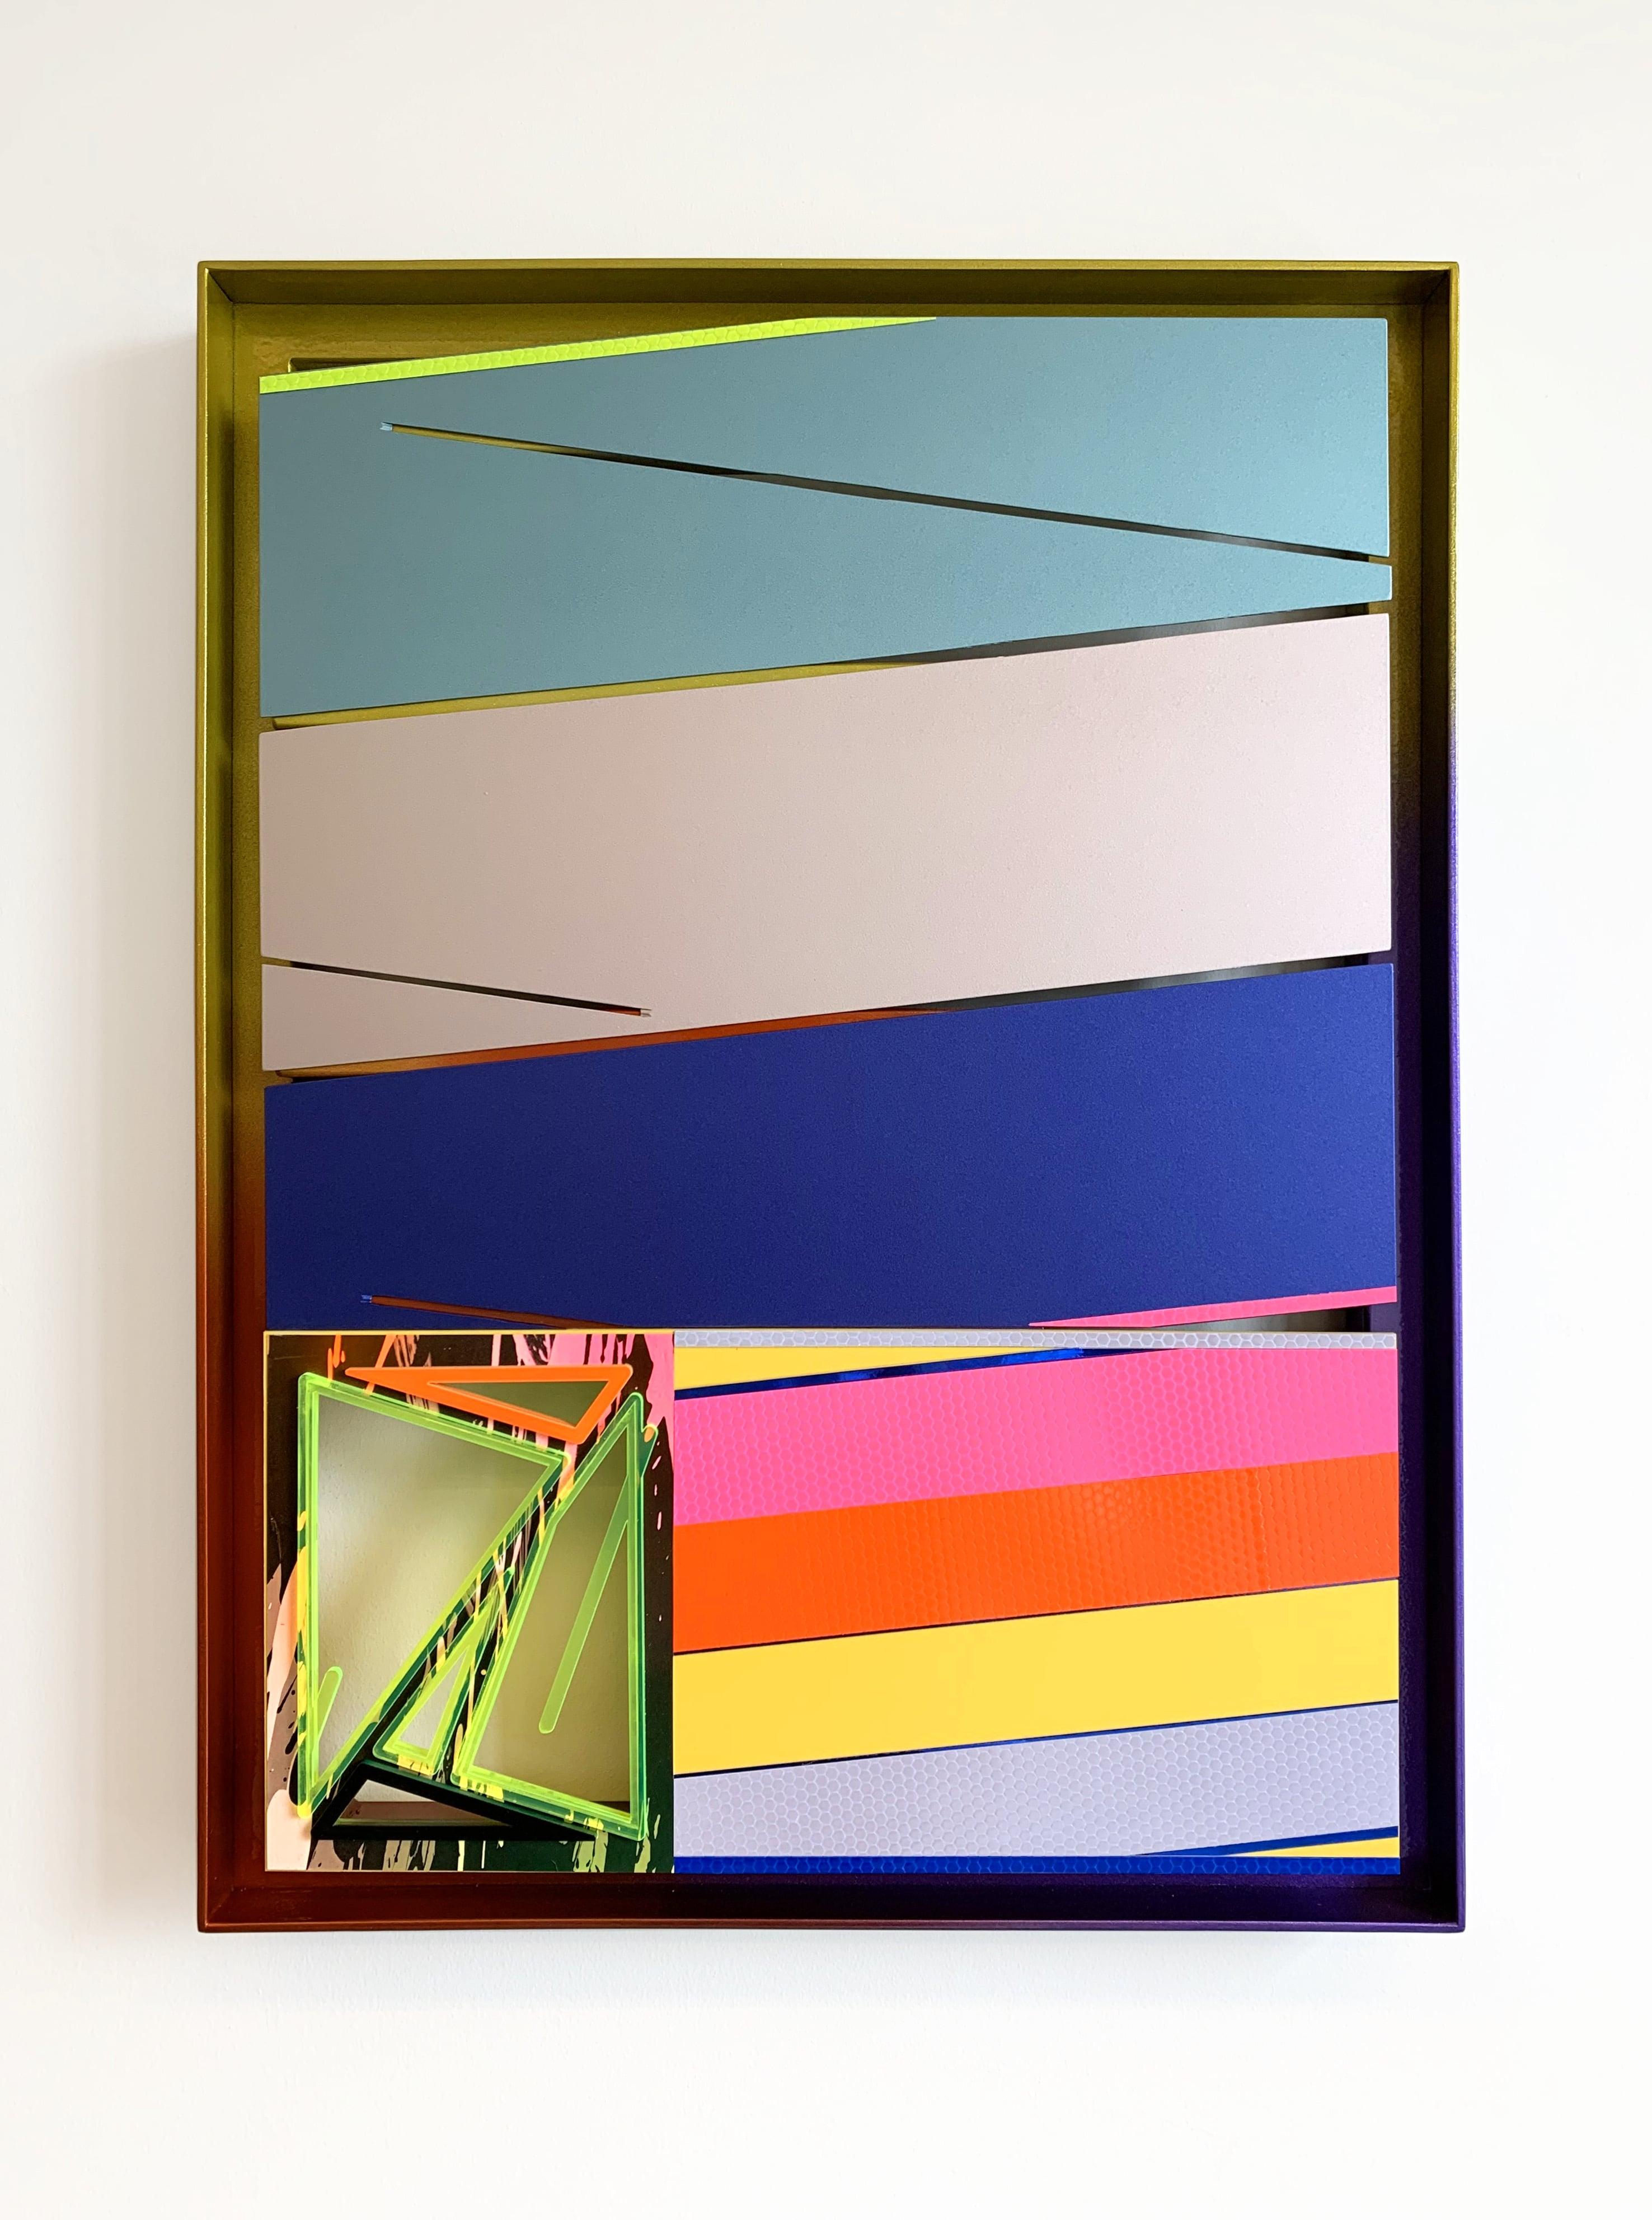 NemesM_Feed-Forward-03_2020_55x40cm_steel-aluminium-carpaint-lasercut-perspex-acrilyc-mirror-board-light-reflective-vinyl-min